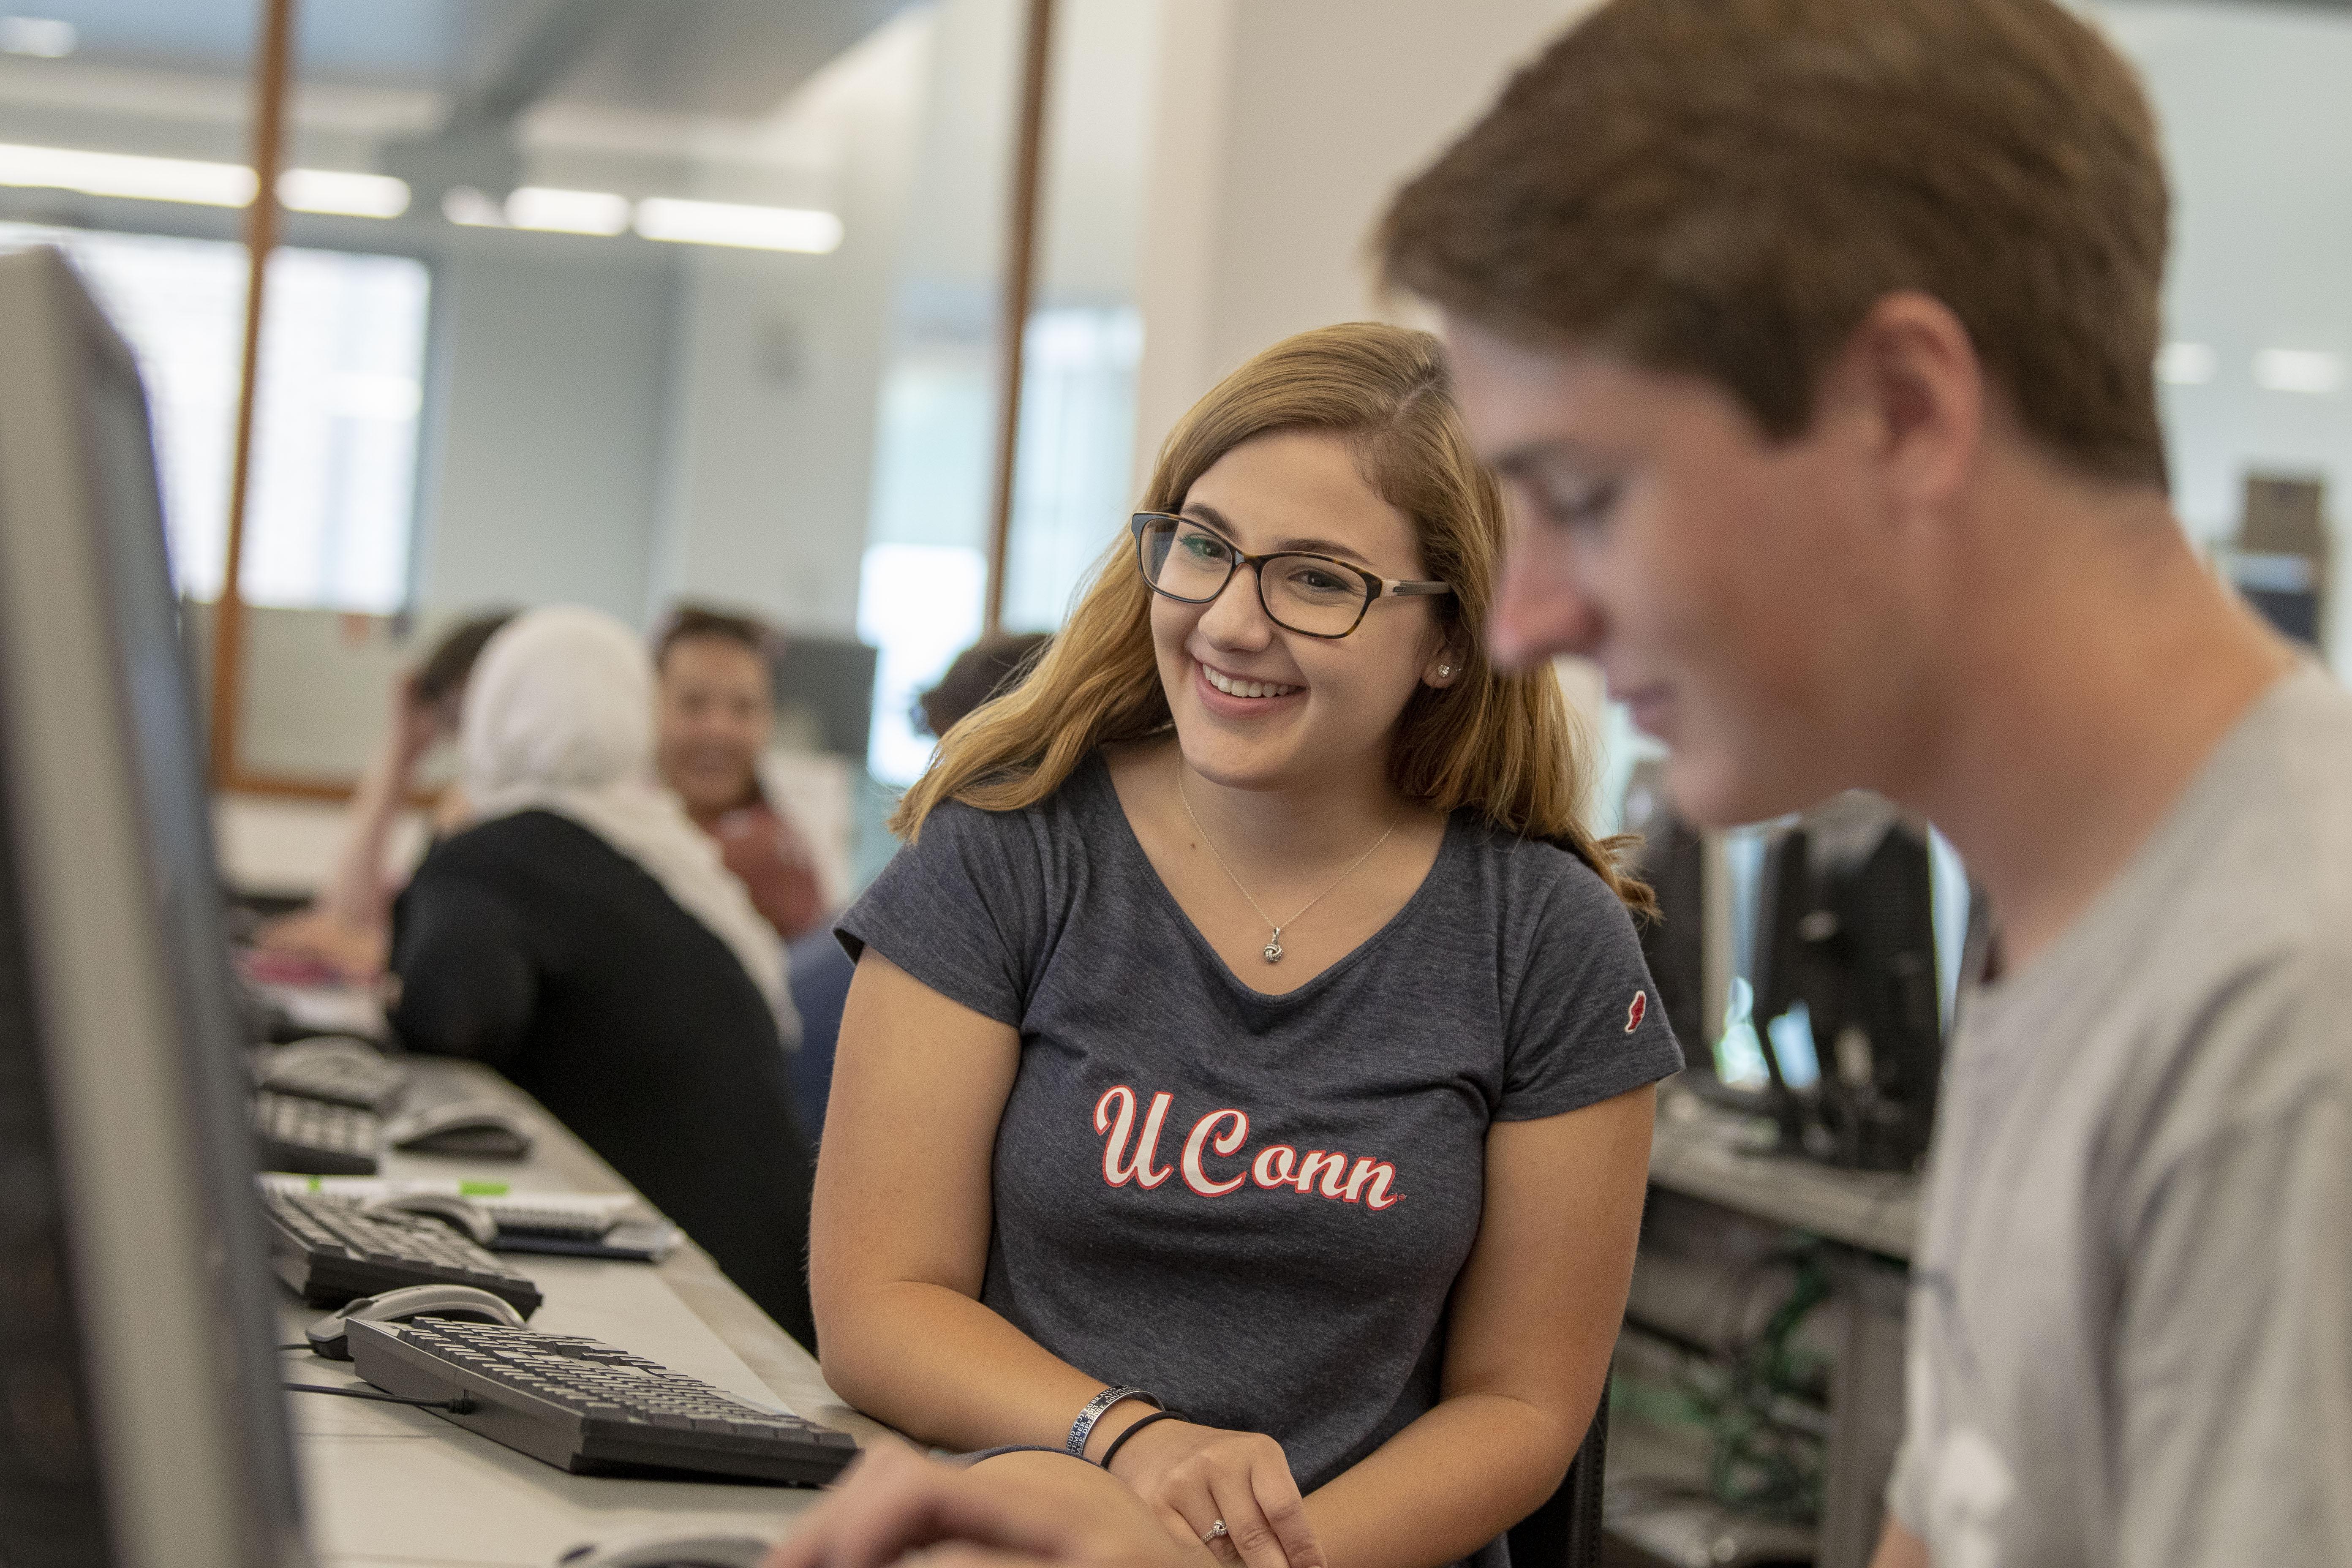 Summer Program - Computer Science | UConn Pre-College Summer: Digital Media - Intro to Programming